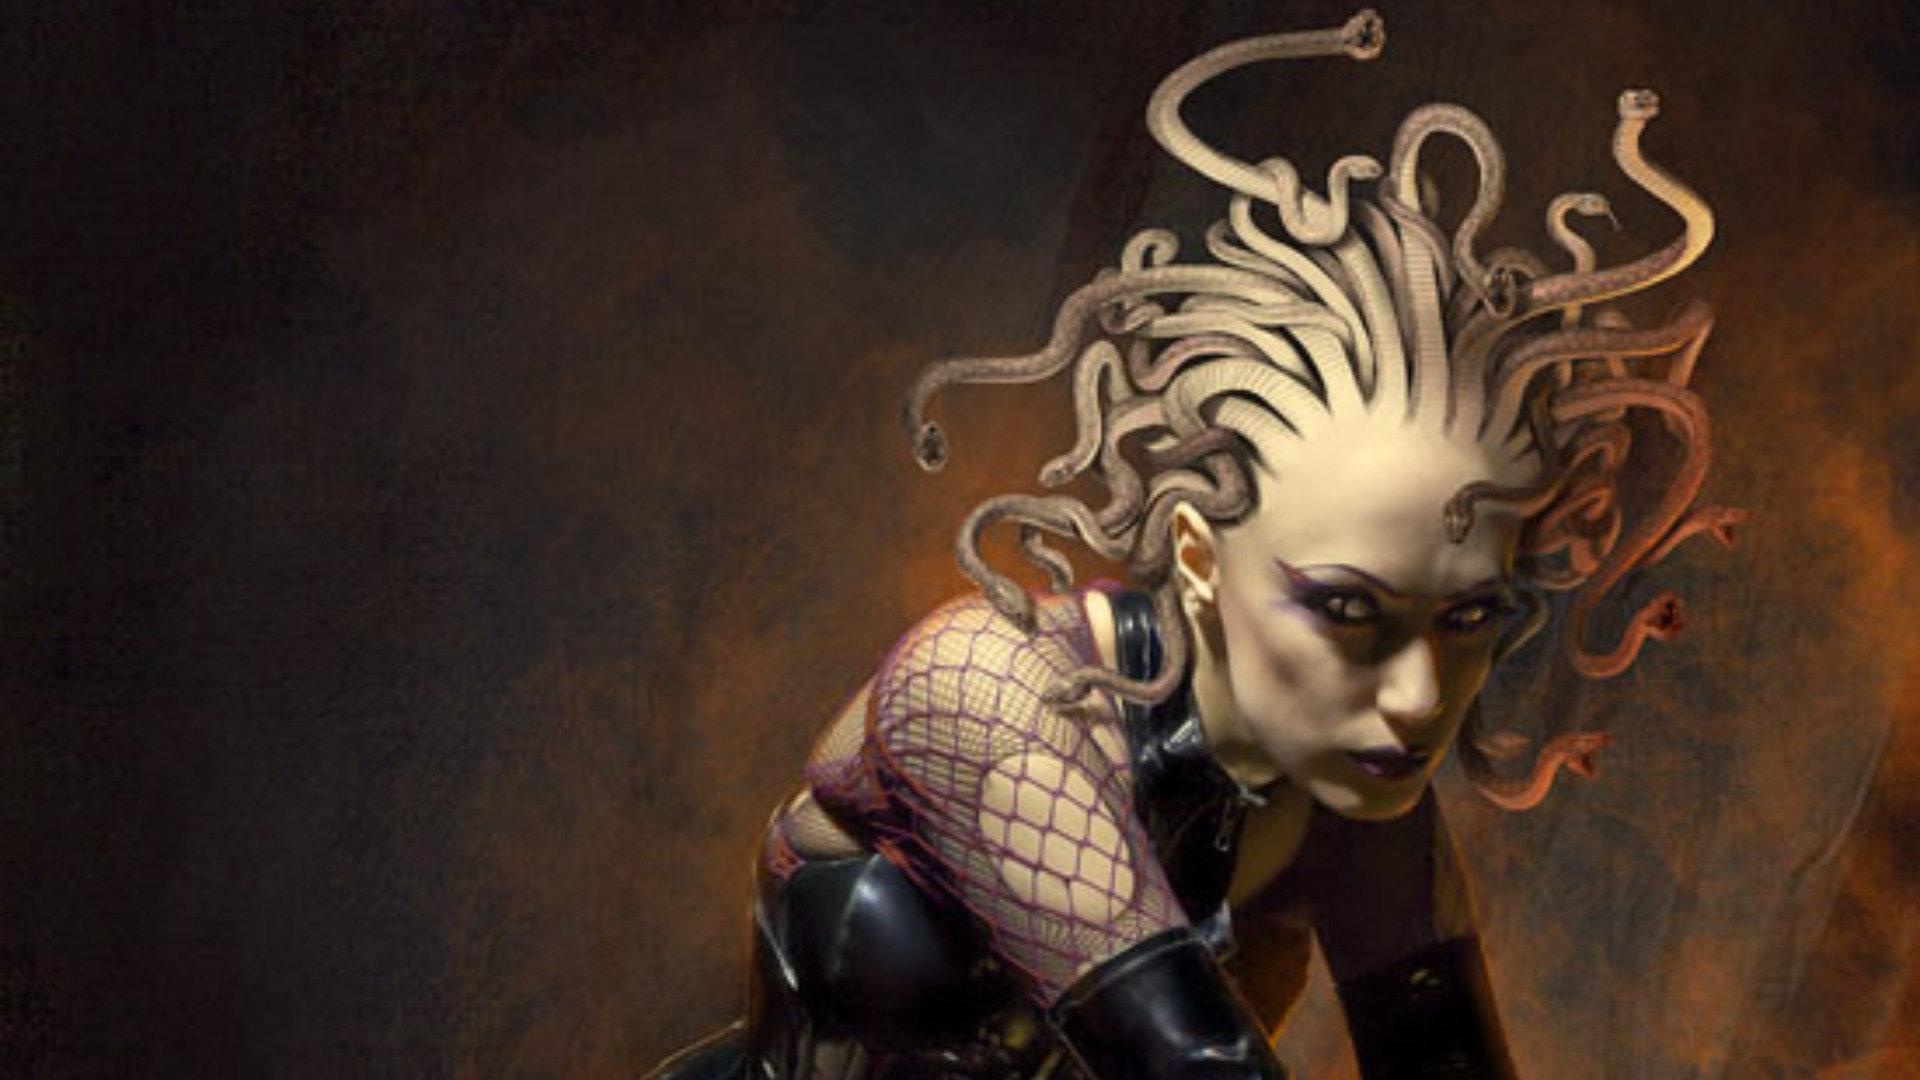 Medusa 3D Wallpapers - Top Free Medusa